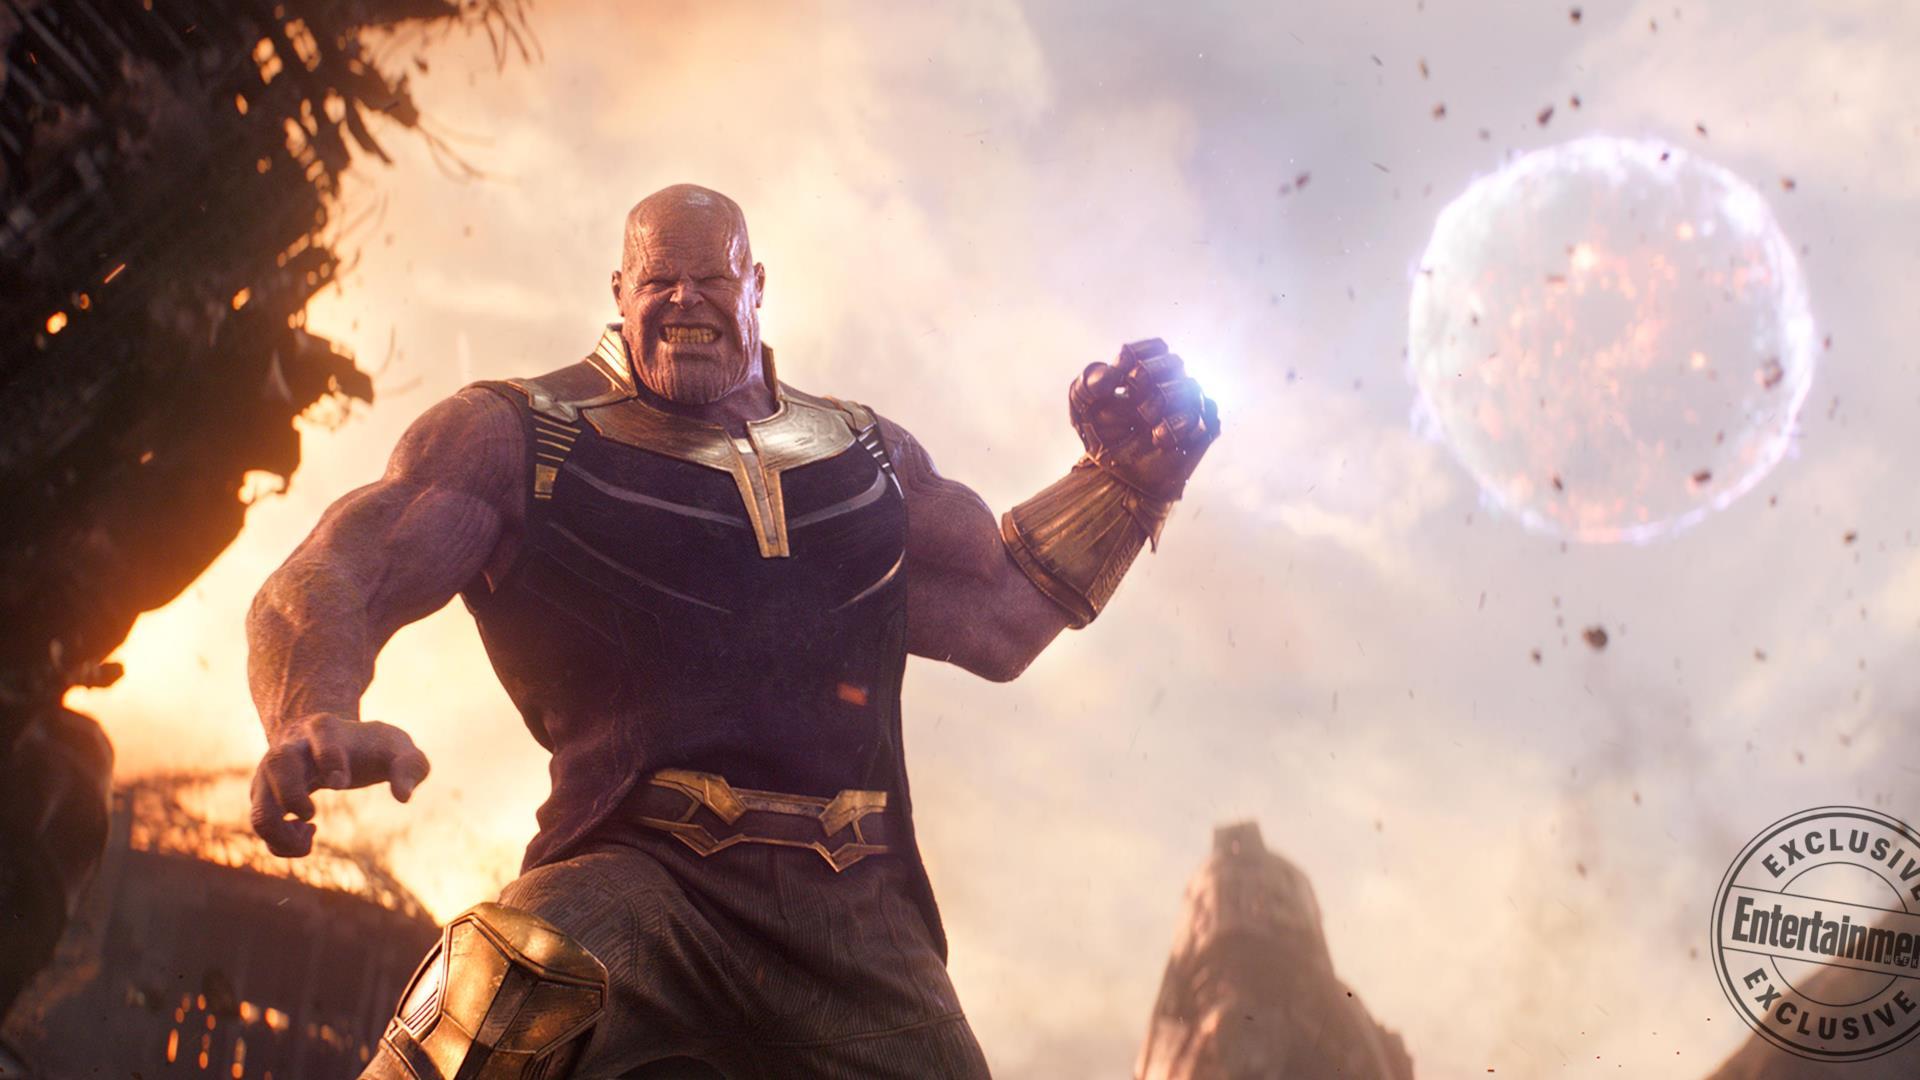 Avengers Infinity War Ecco Perche Thanos Vuole Le Gemme Dell